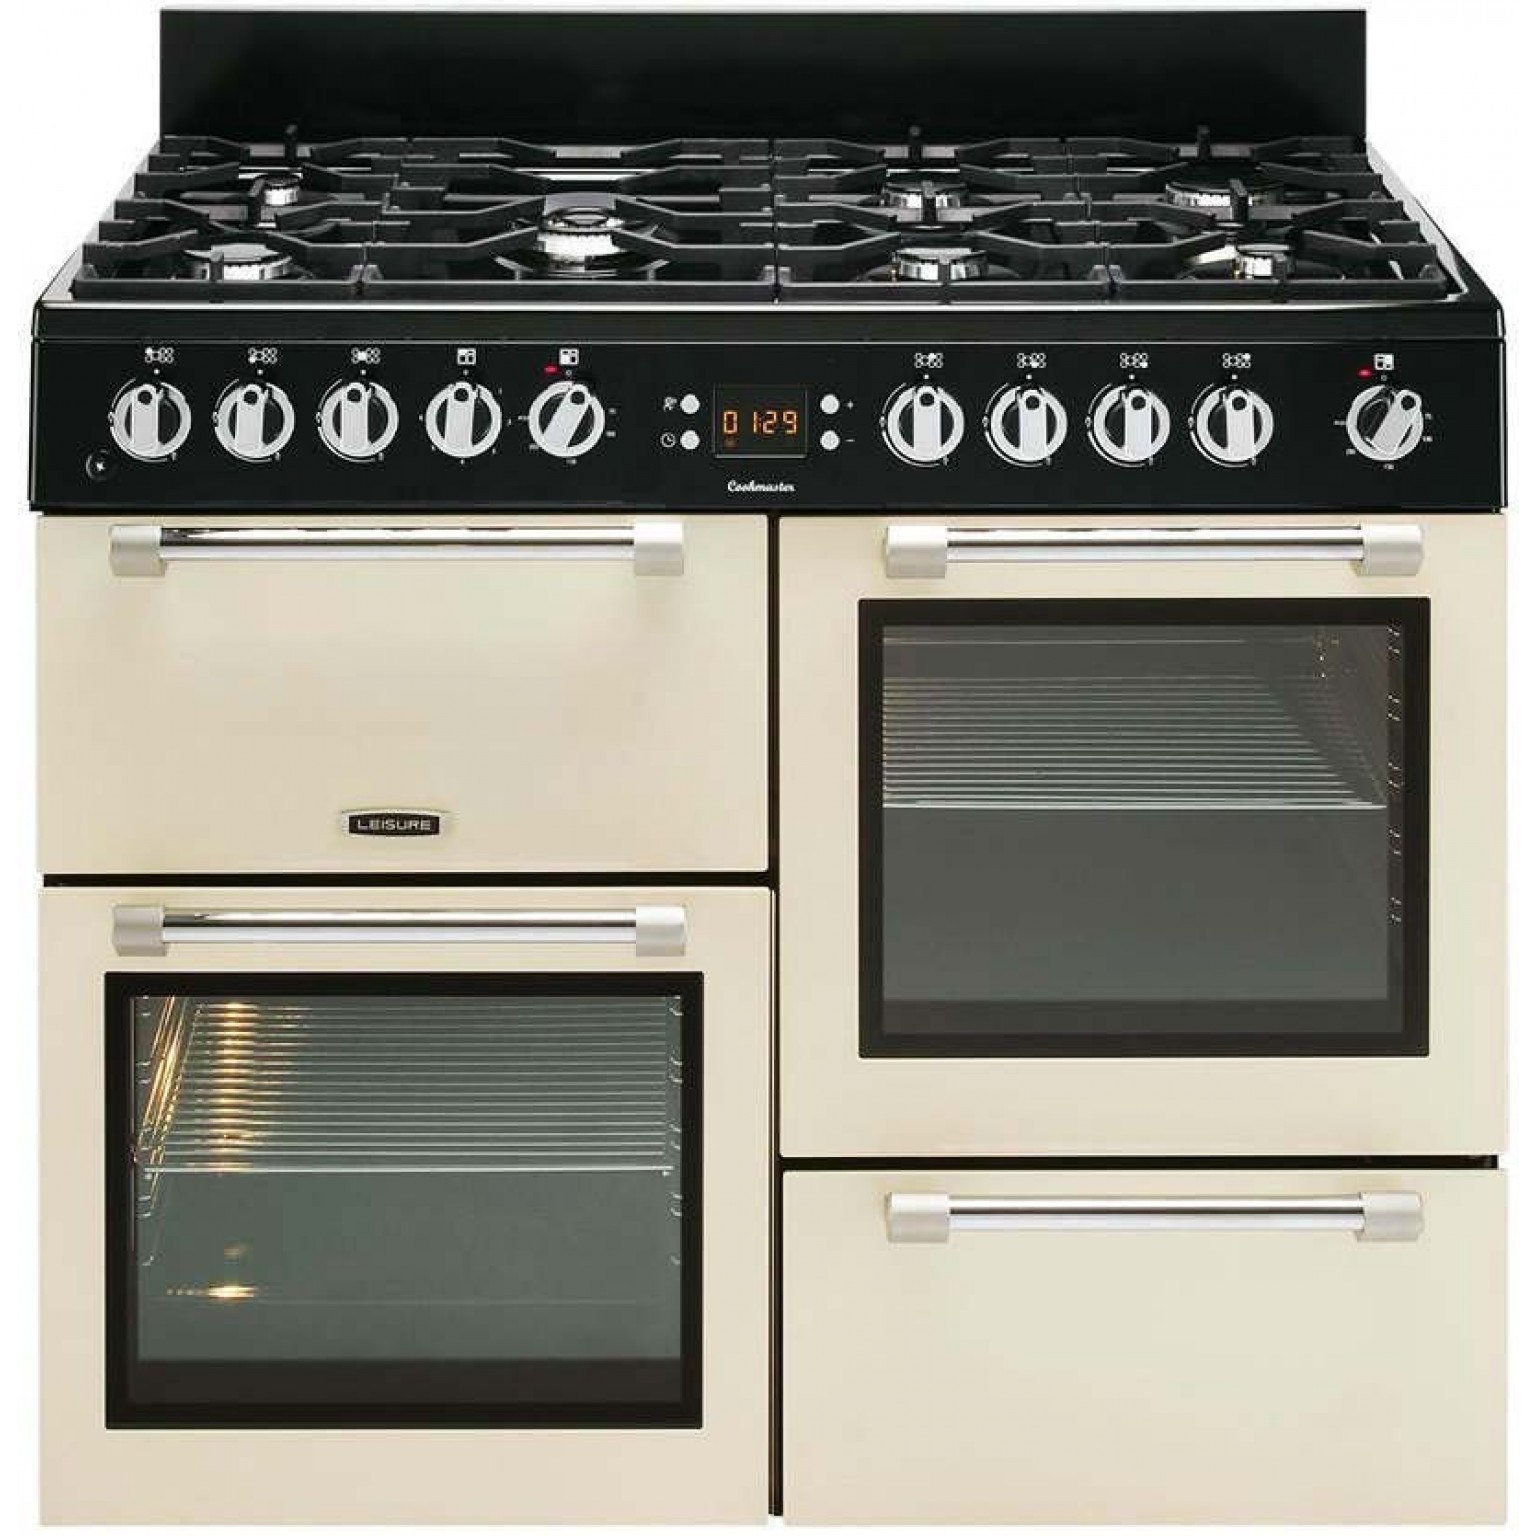 LEISURE 'Cookmaster' 100cm Dual Fuel Range Cooker CK100F232C